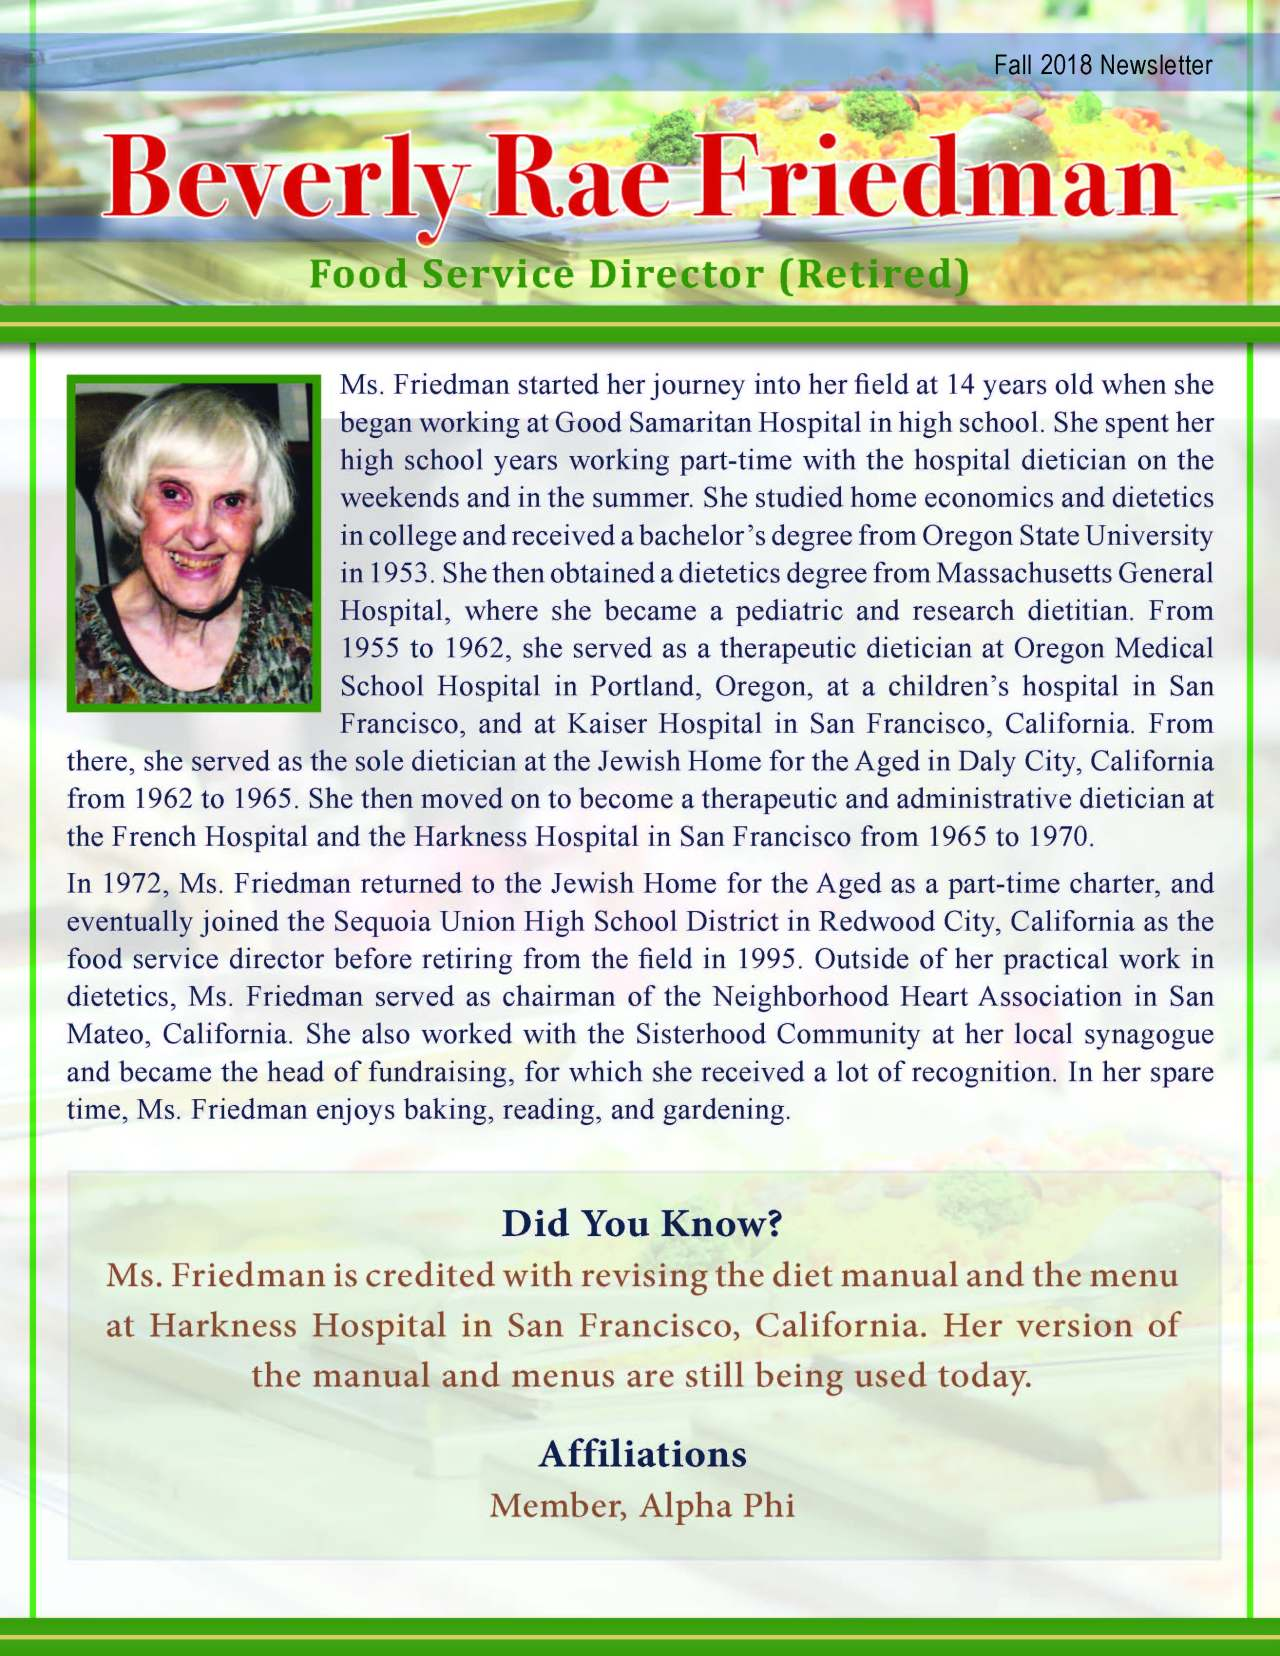 Beverly Friedman